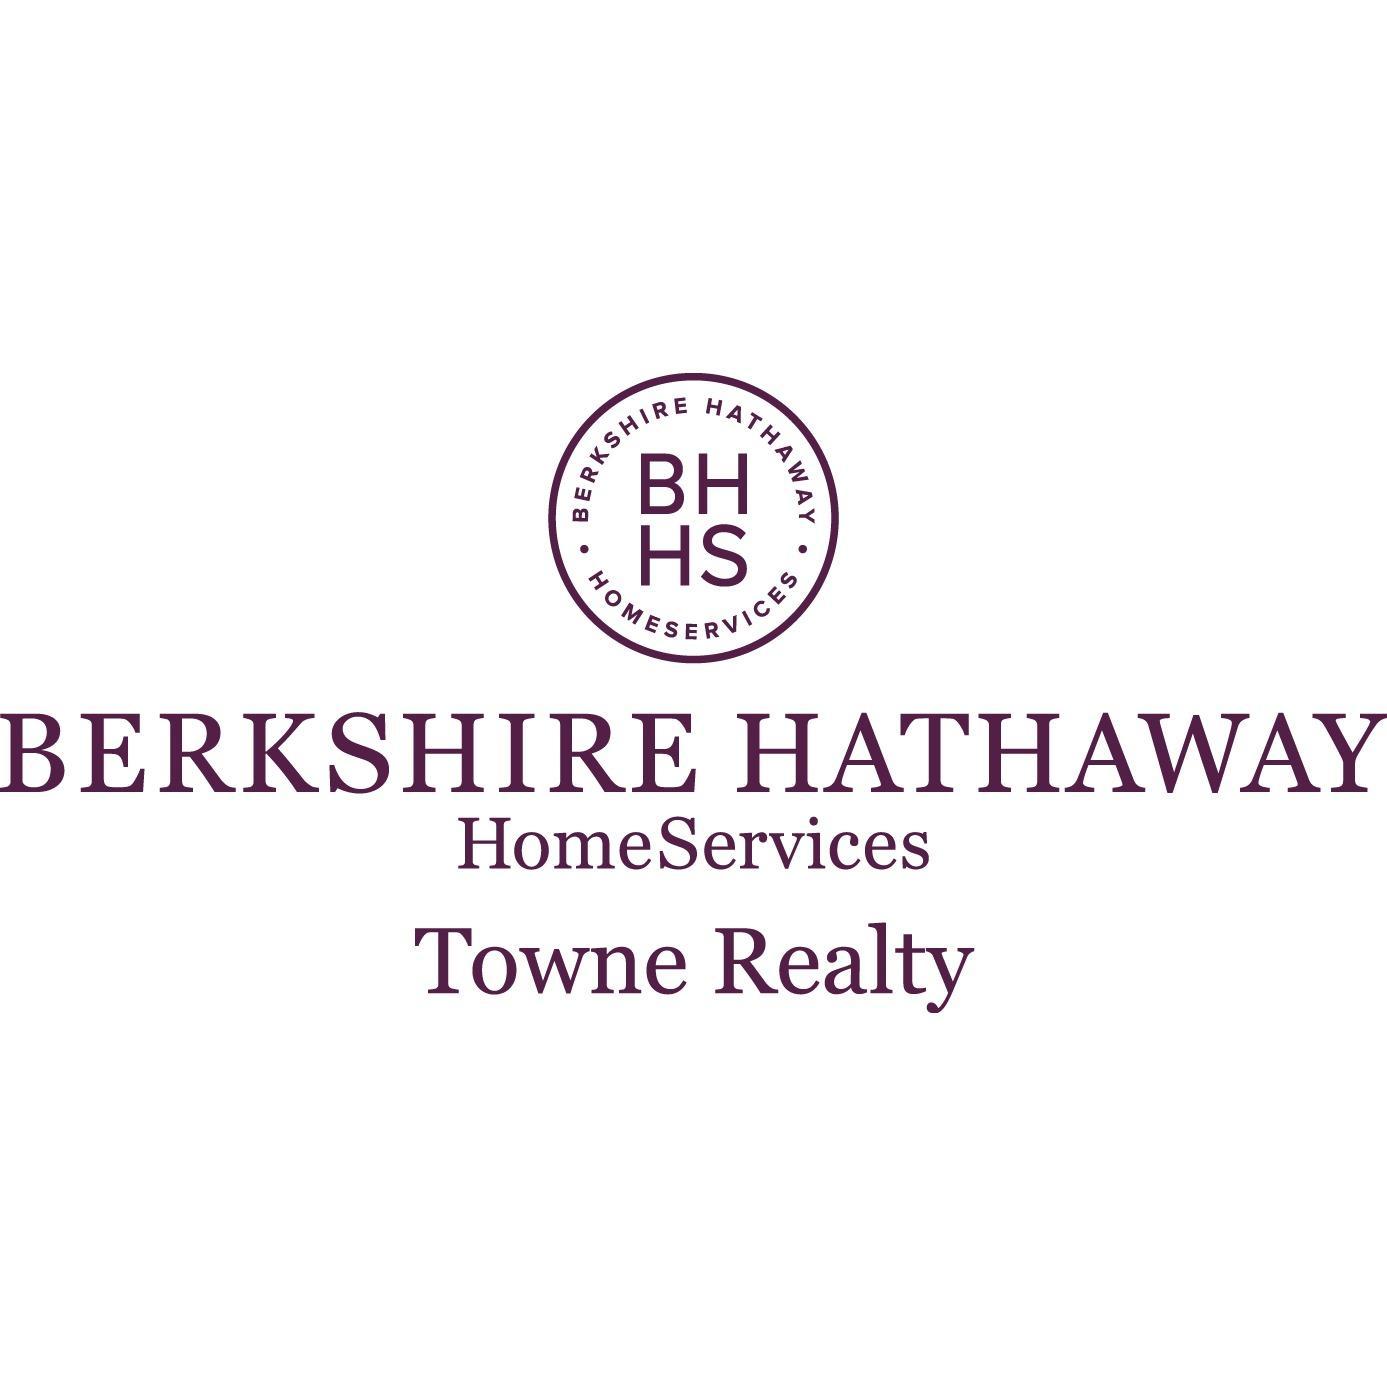 Sue DeValdes | Berkshire Hathaway HomeServices Towne Realty